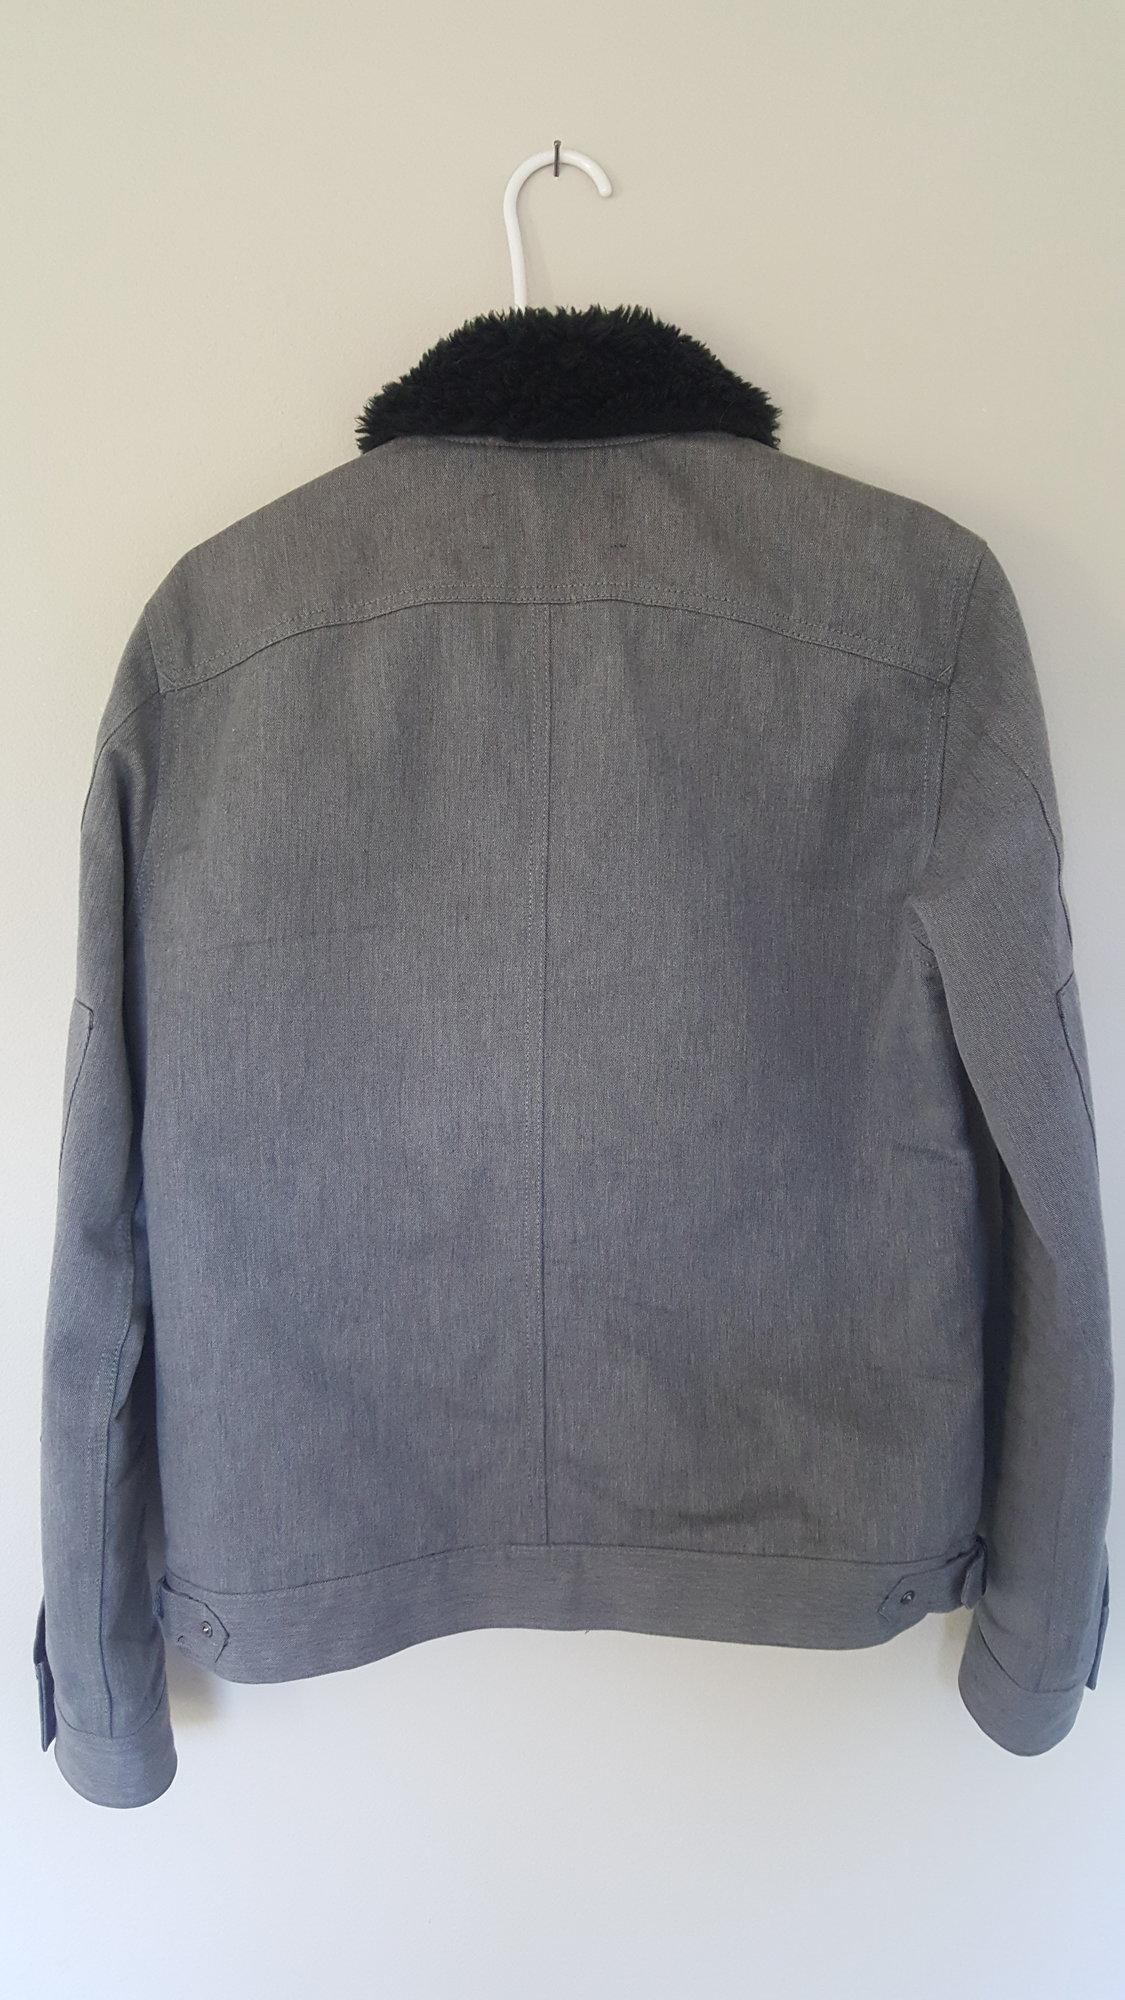 jacket1 2.jpg